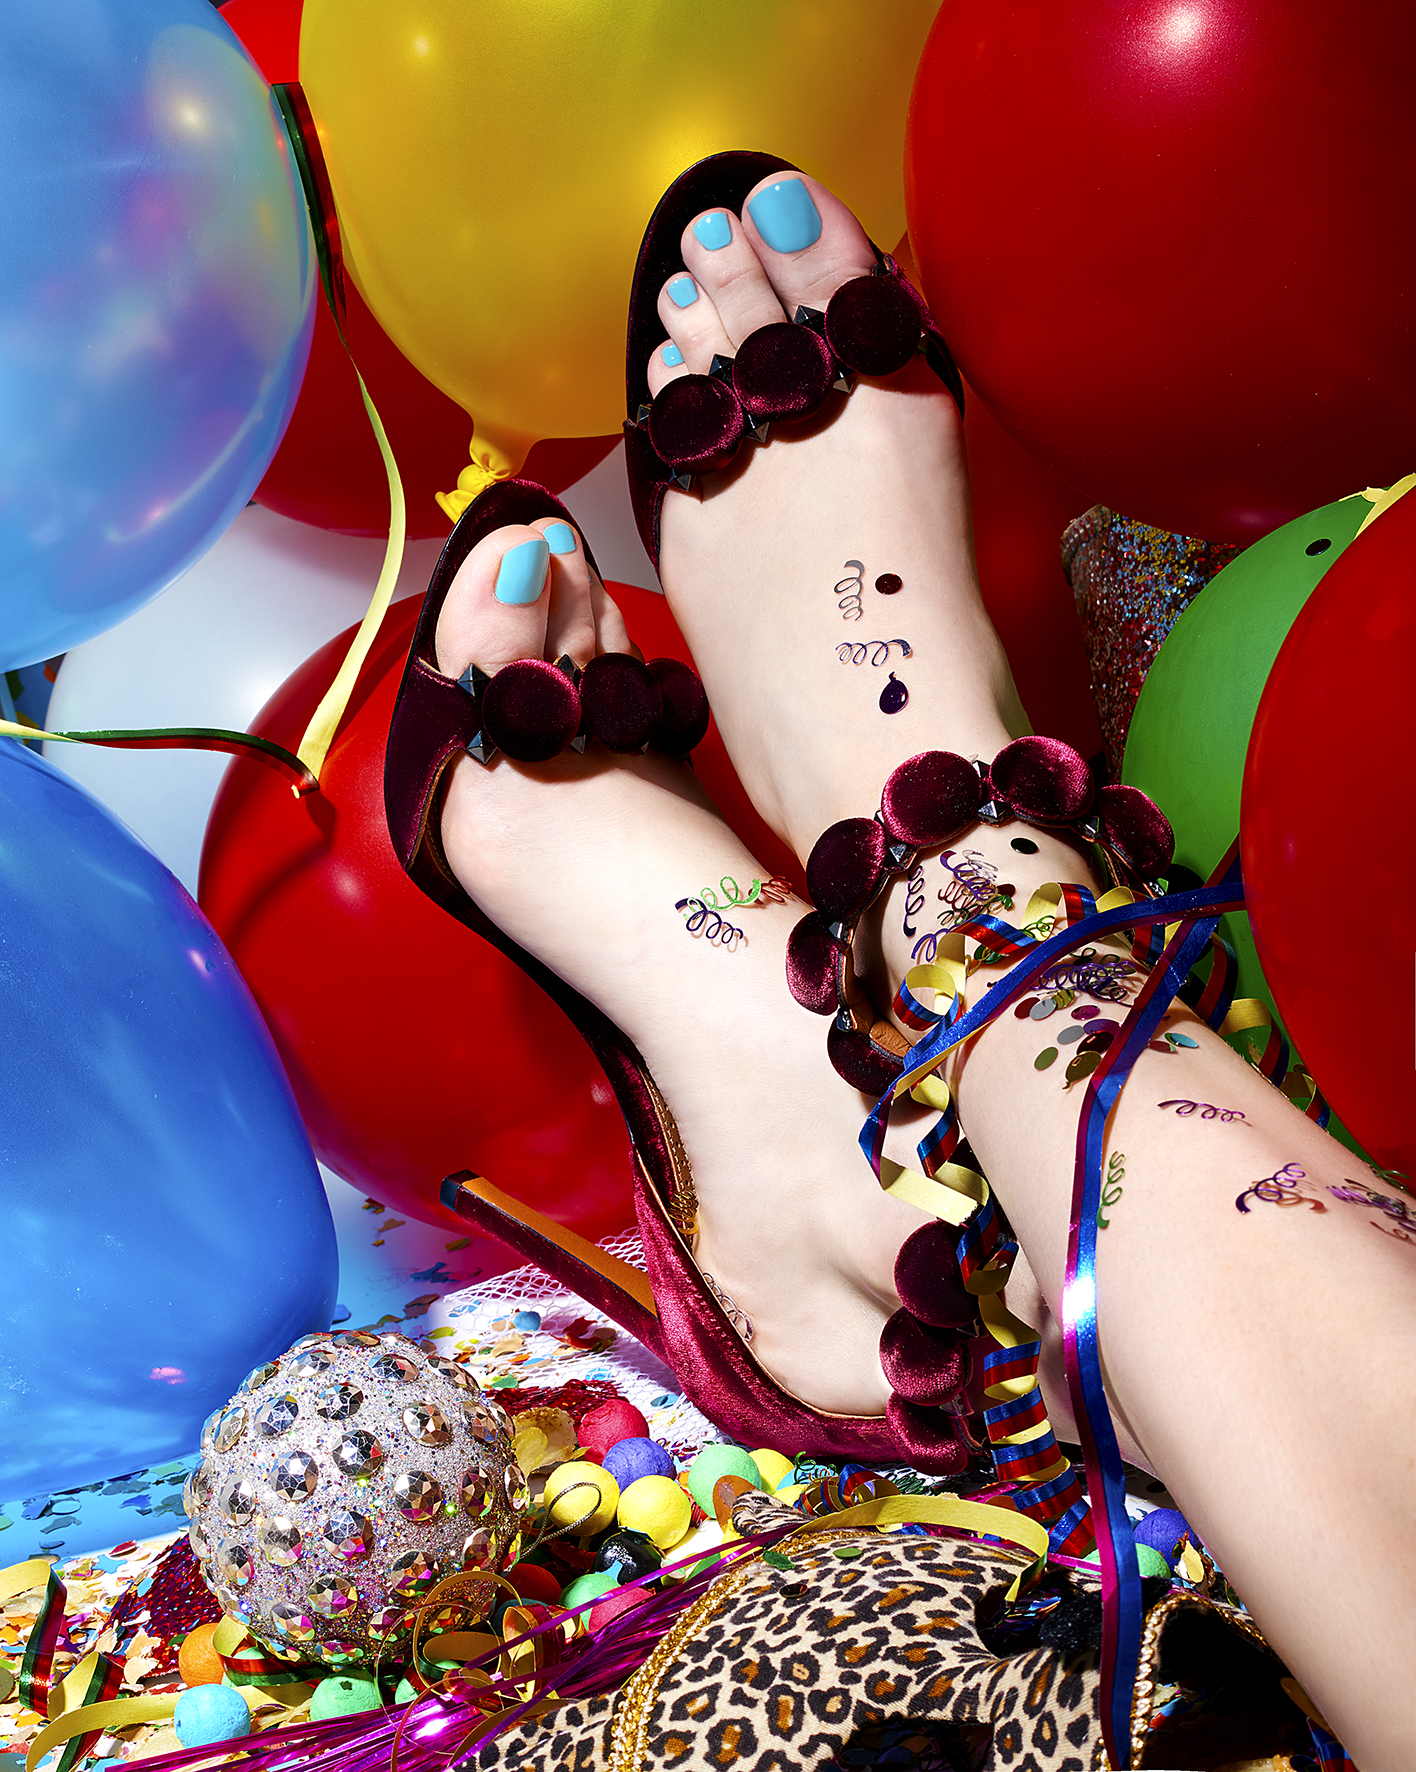 Sandales : AZZEDINE ALAIA